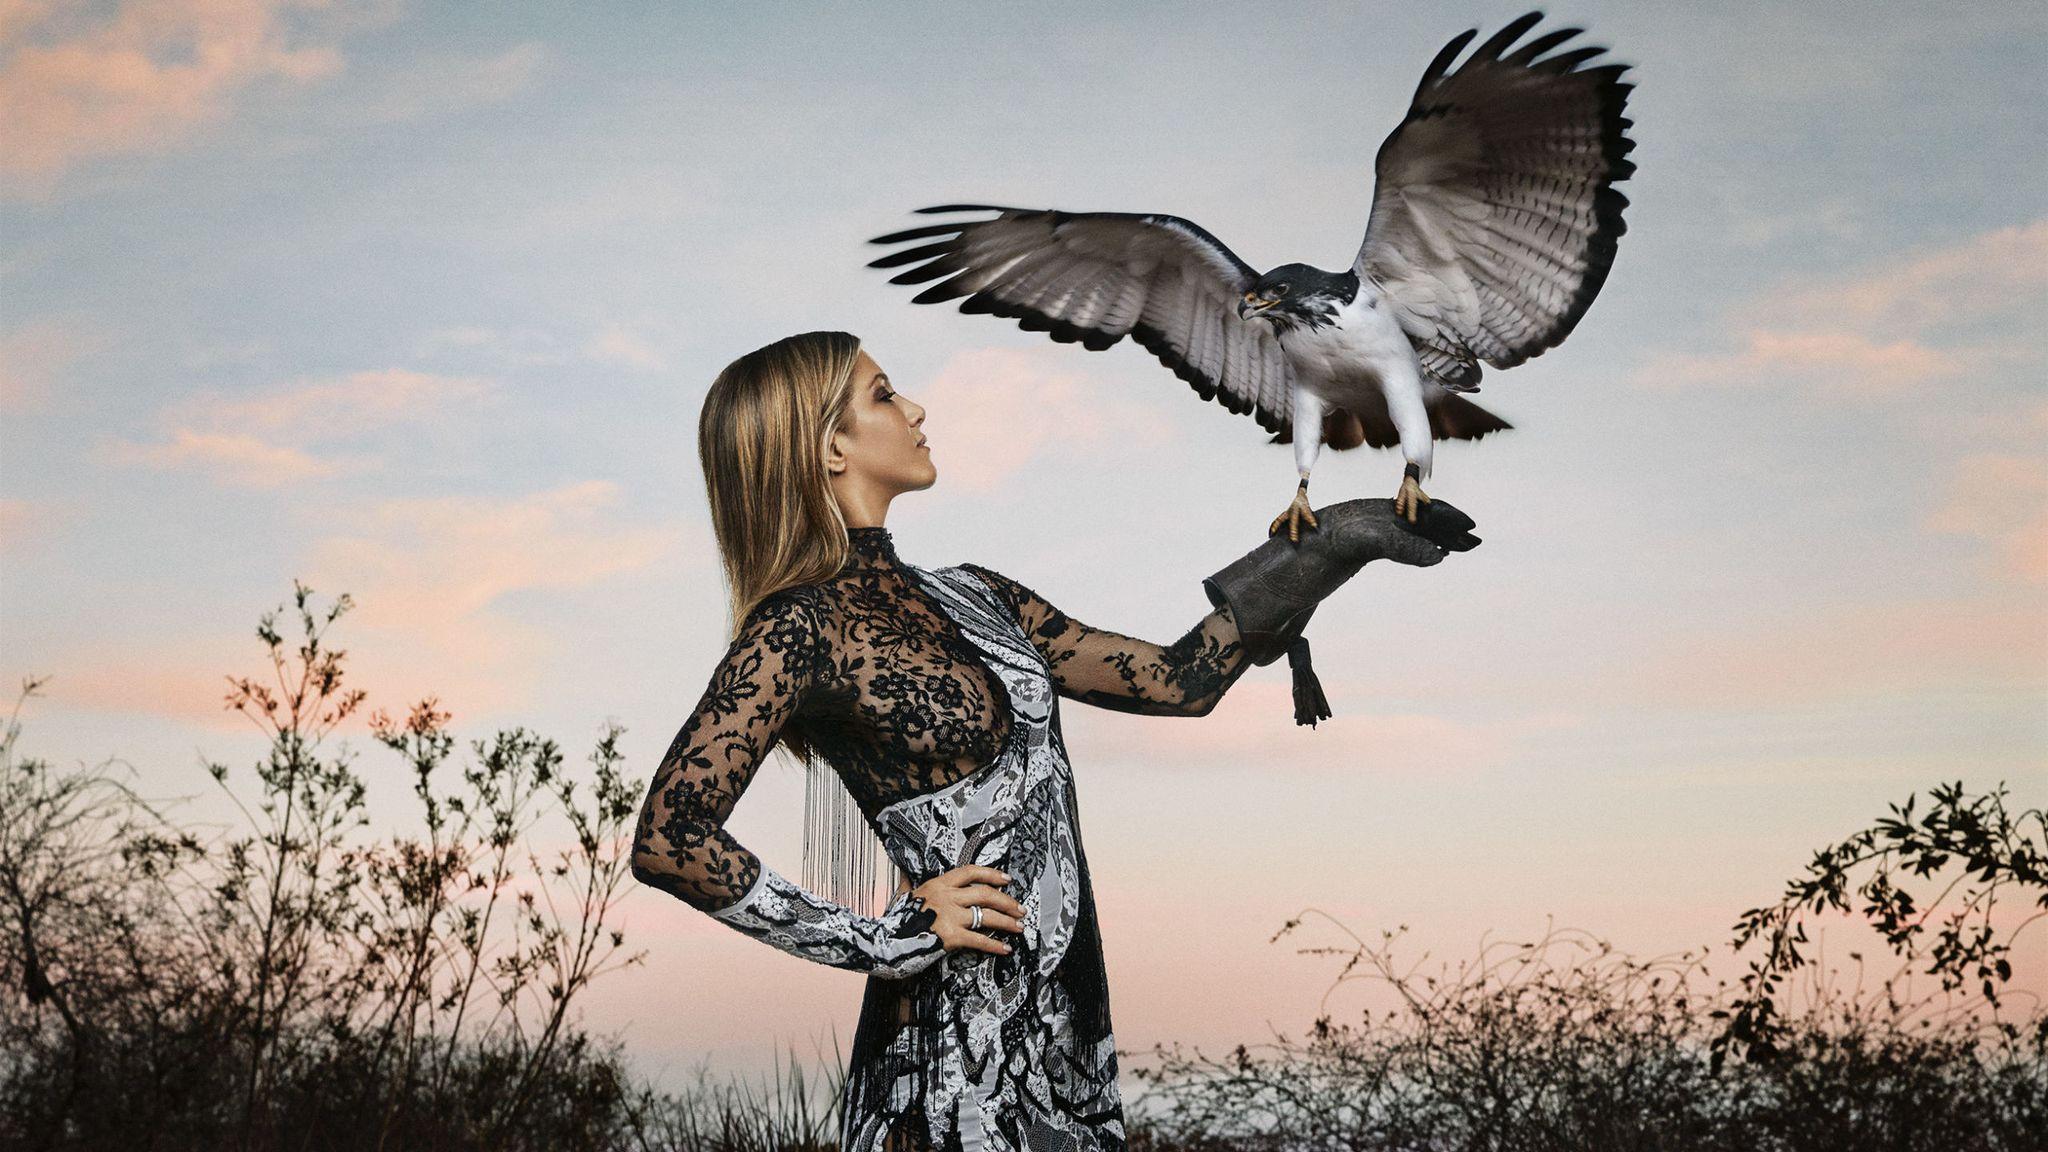 Jennifer Aniston Takes Flight